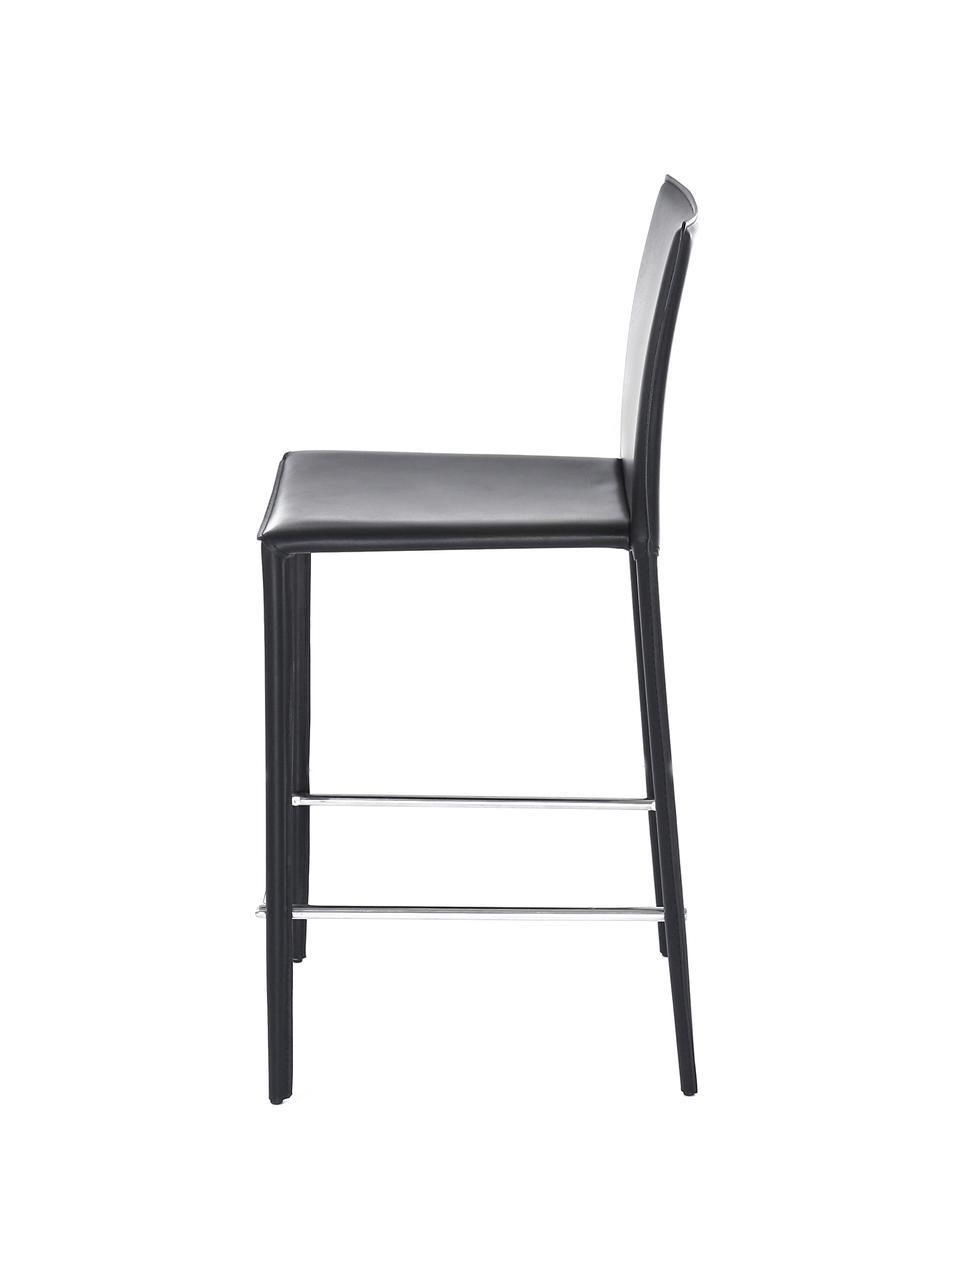 Leder-Thekenstühle Boréalys, 2Stück, Sitzfläche: Recyceltes Leder (70% Led, Gestell: Metall, pulverbeschichtet, Schwarz, 44 x 98 cm